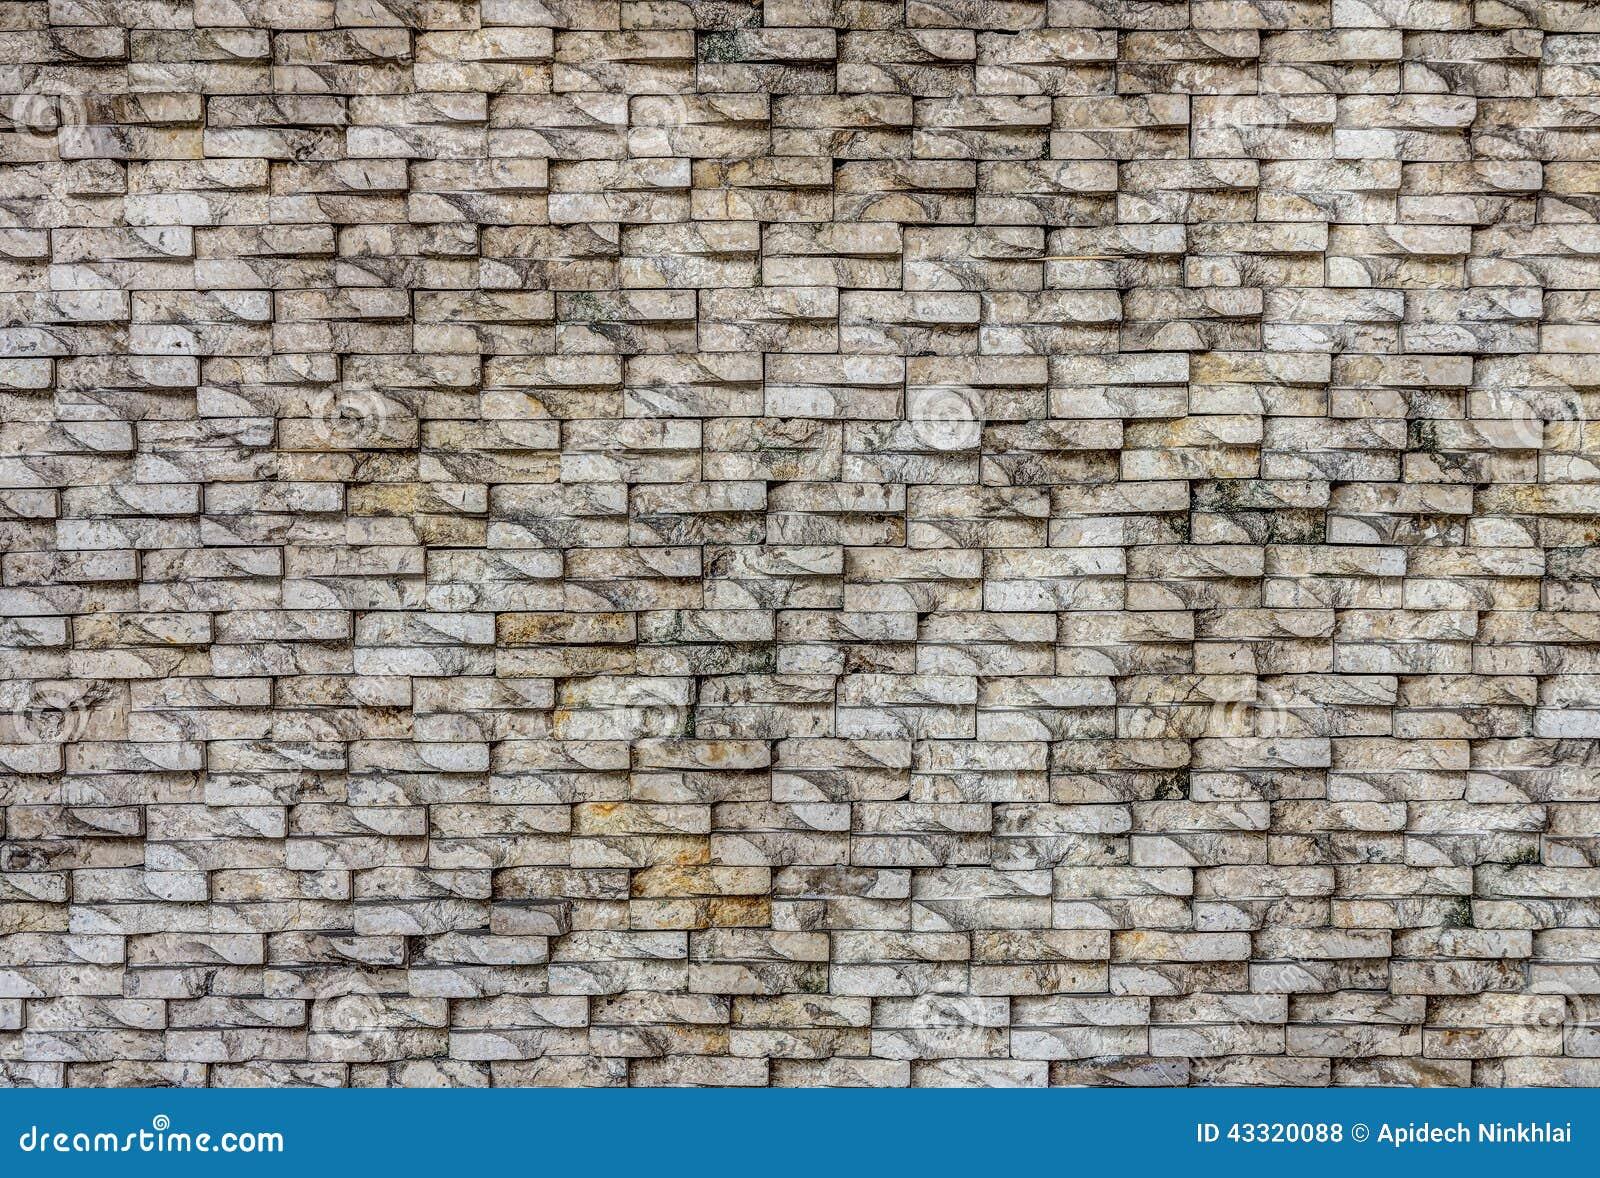 Natural Stone Tile Wall Panels : Natural stone tiles wall stock photo image